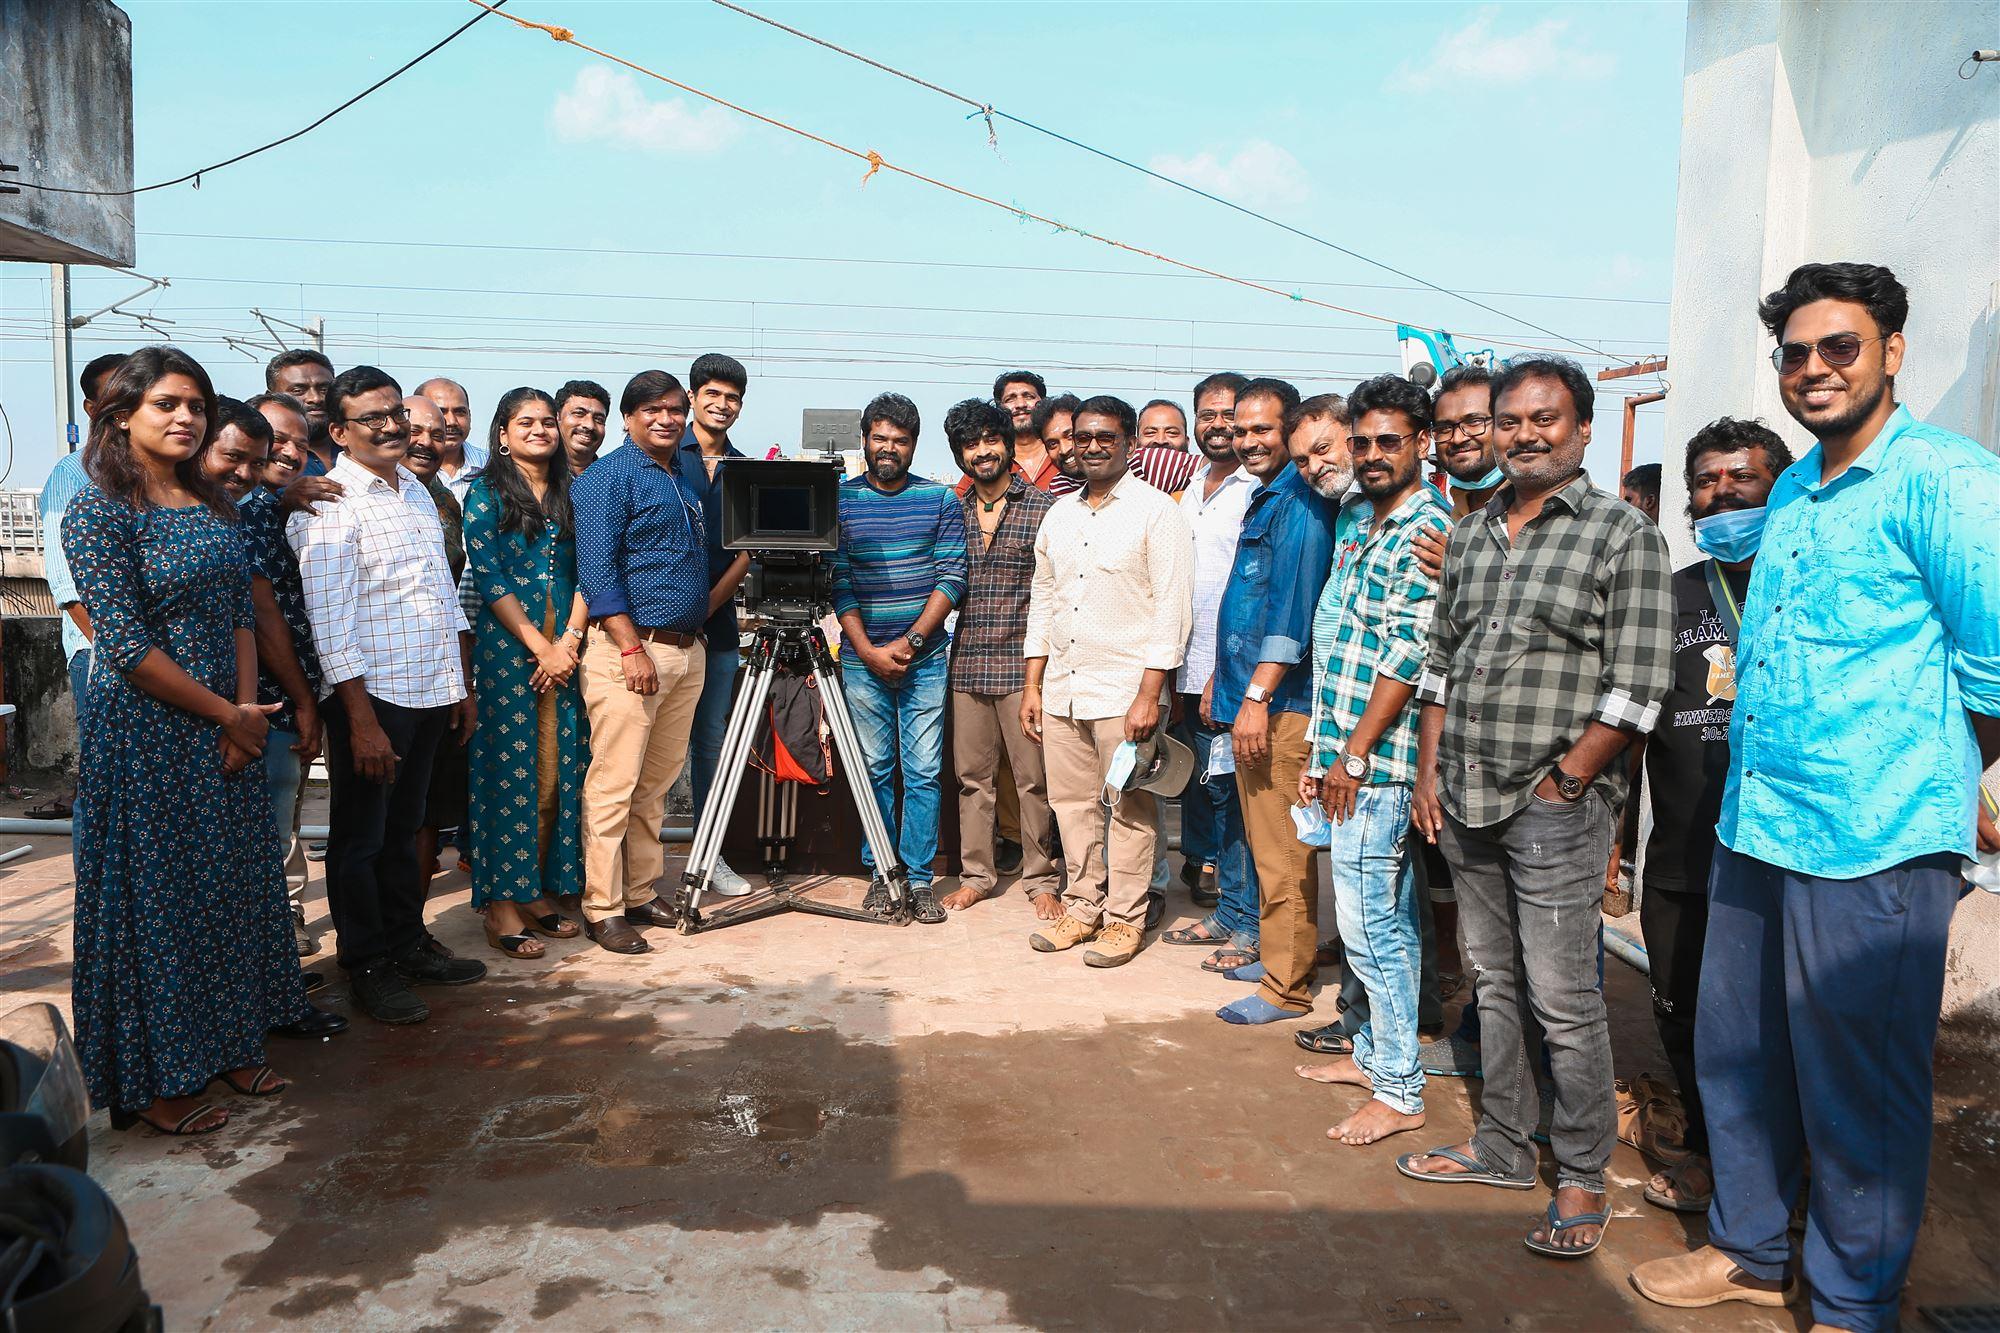 Shooting of director Vasanthabalan's Urban Boyz Studios' maiden production venture starts